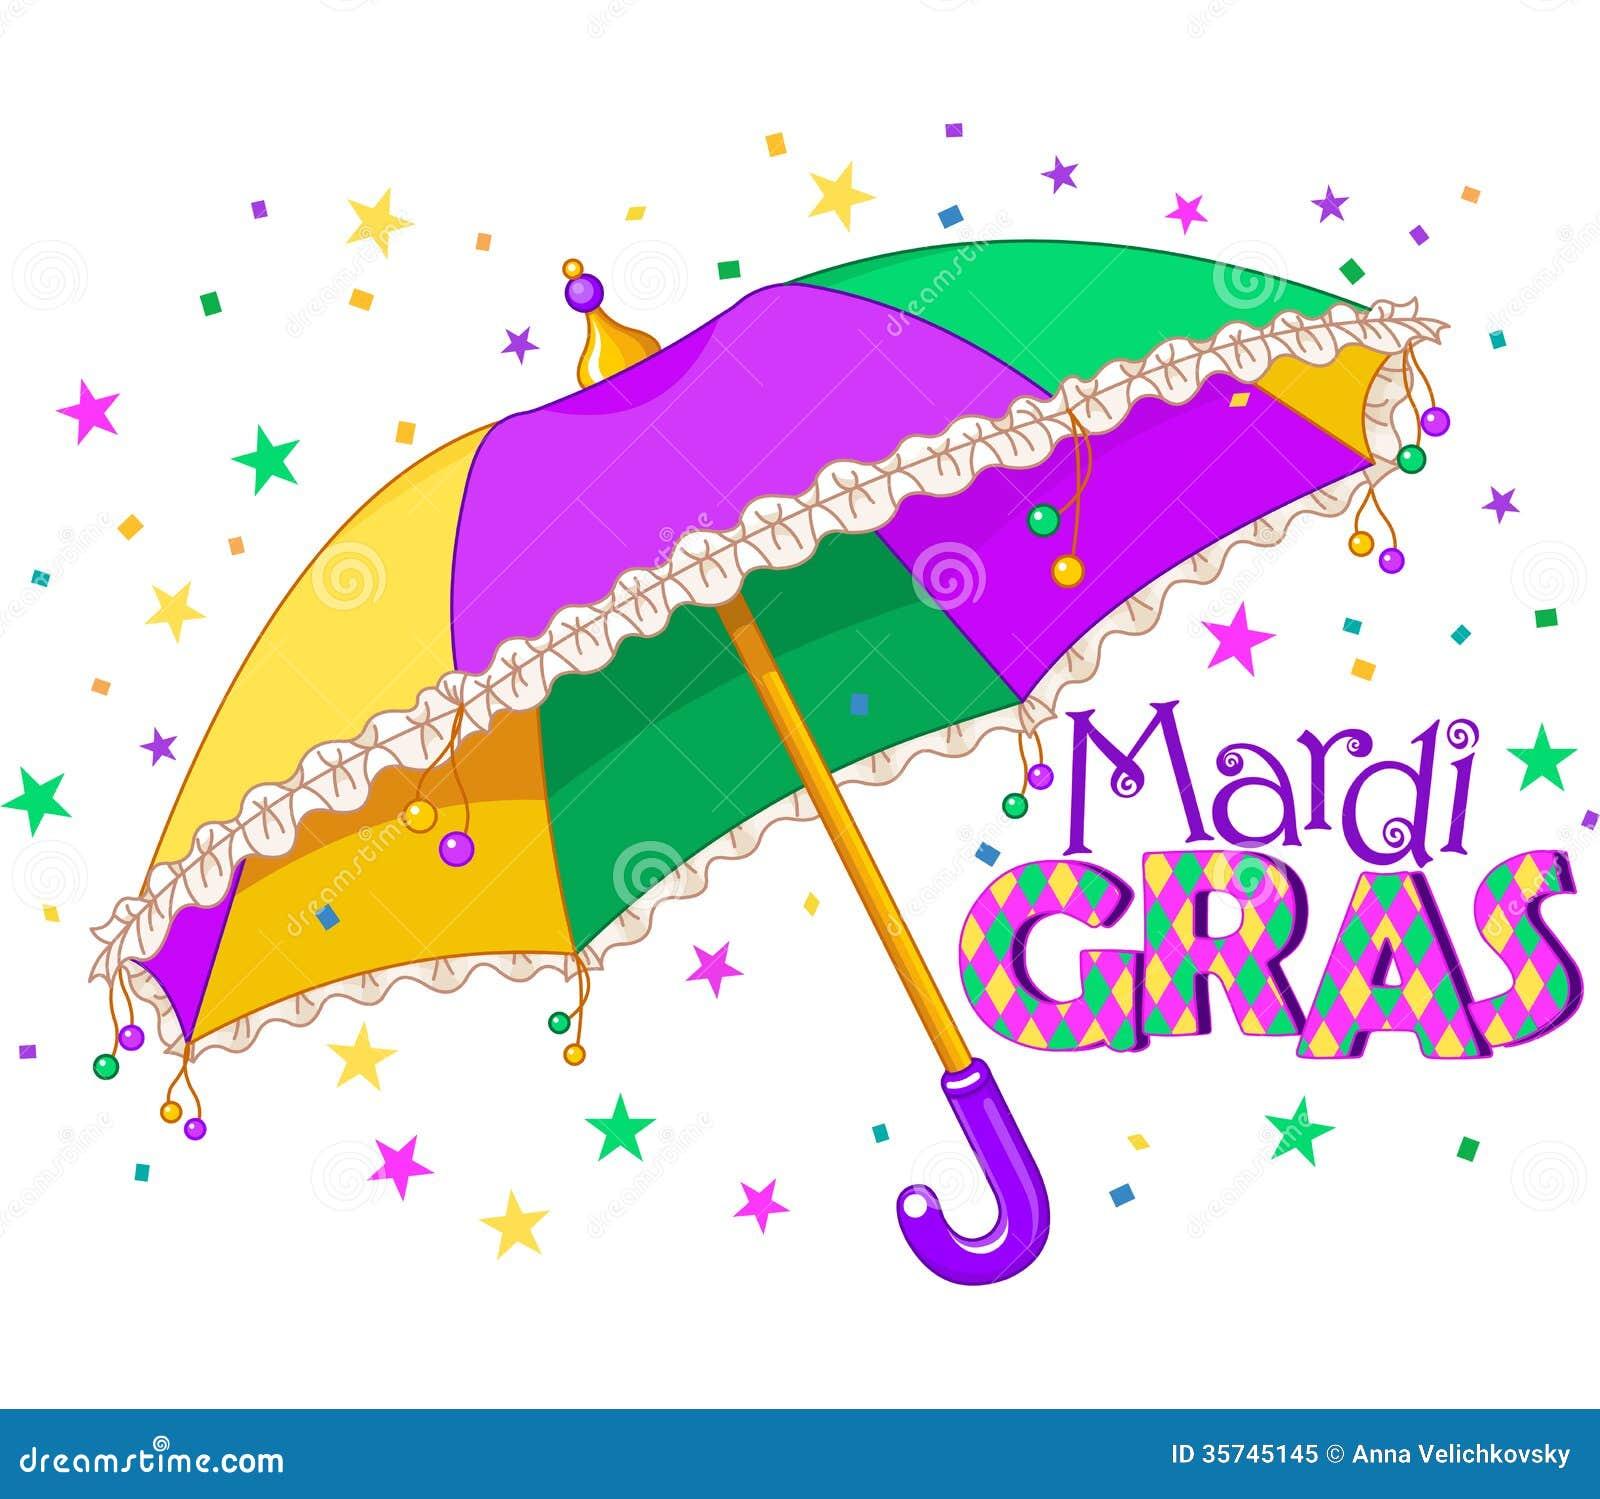 Mardi Gras Clip Art Borders Mardi gras umbrella royalty